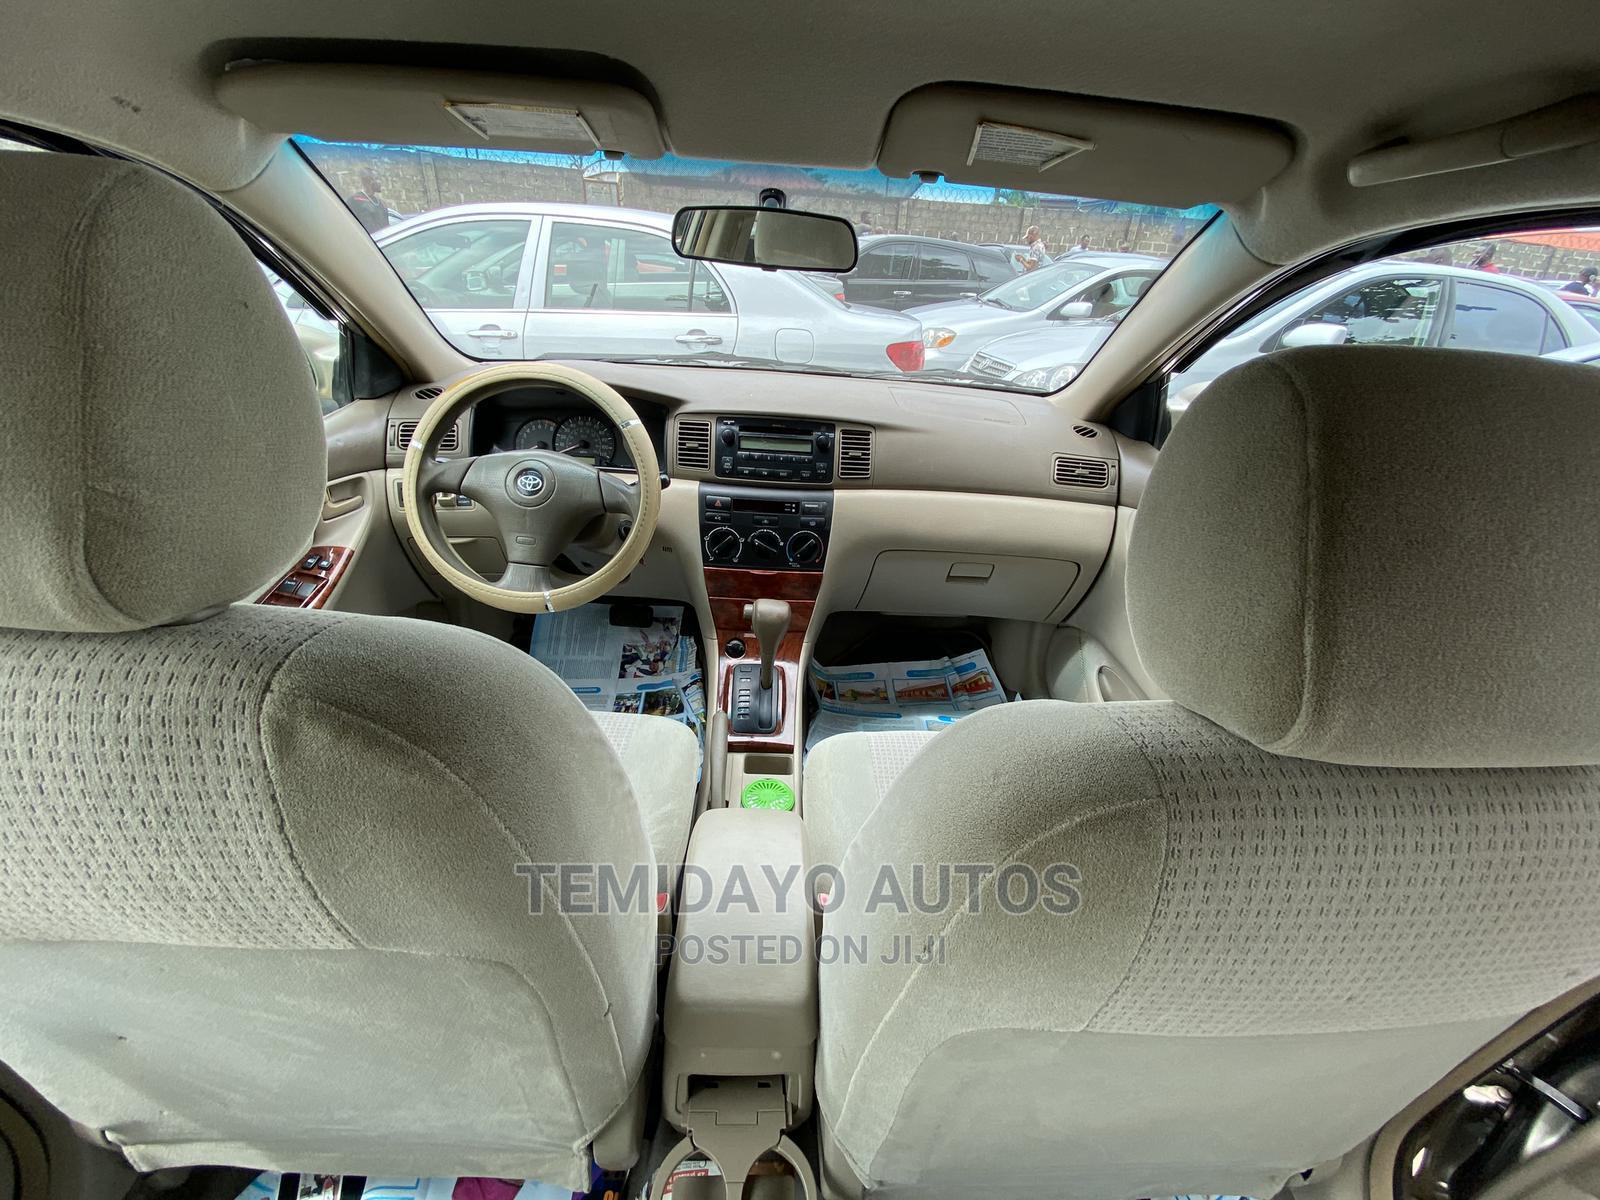 Toyota Corolla 2008 Gold | Cars for sale in Apapa, Lagos State, Nigeria